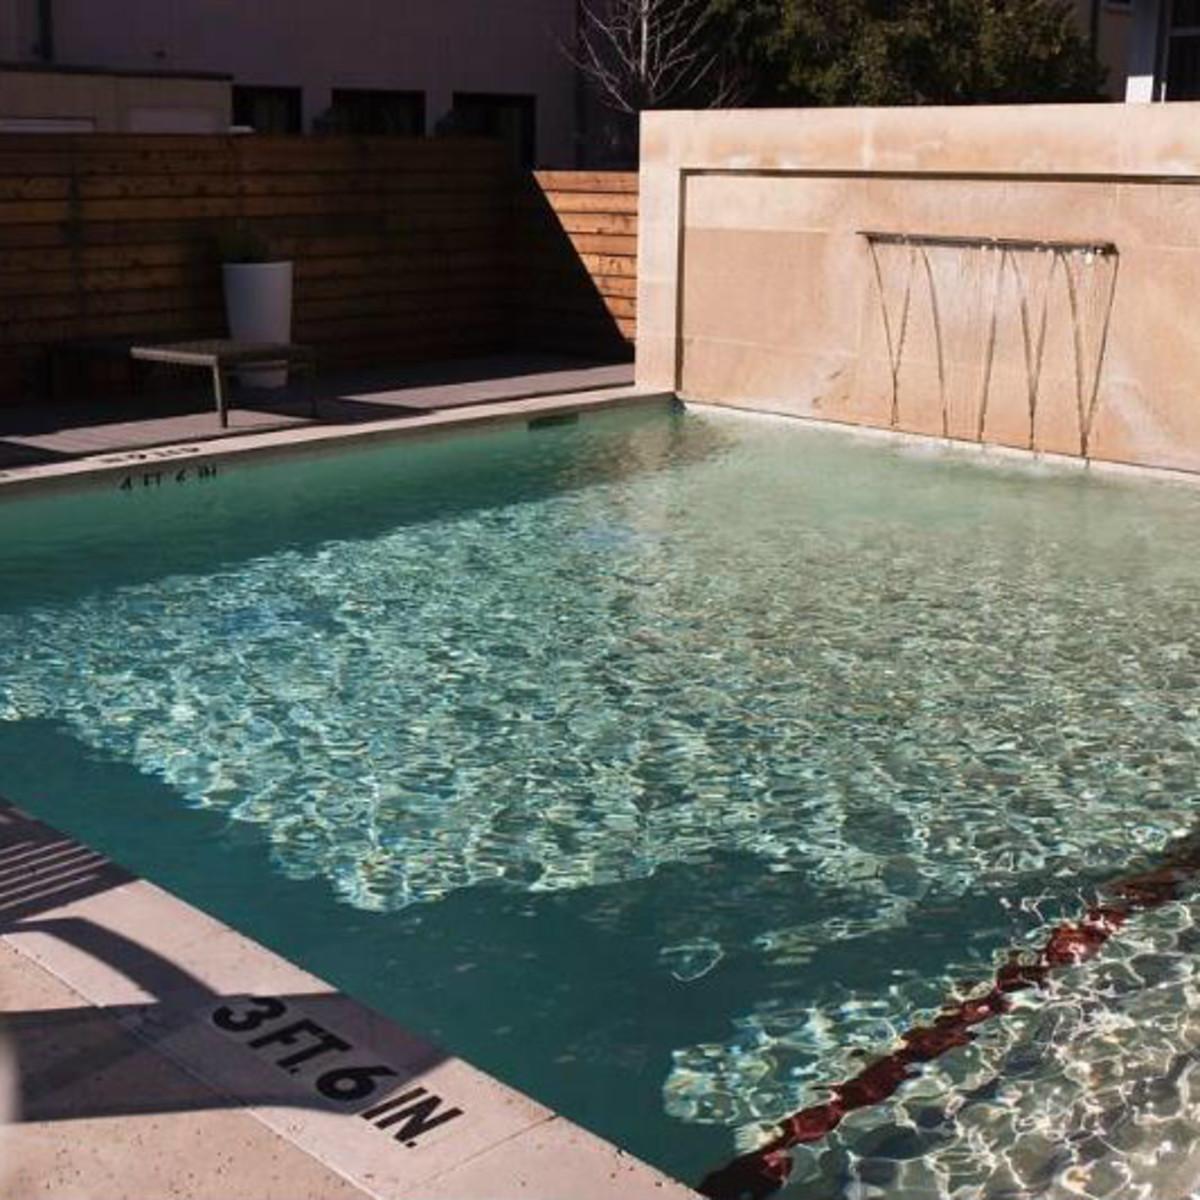 2608 Museum Way pool